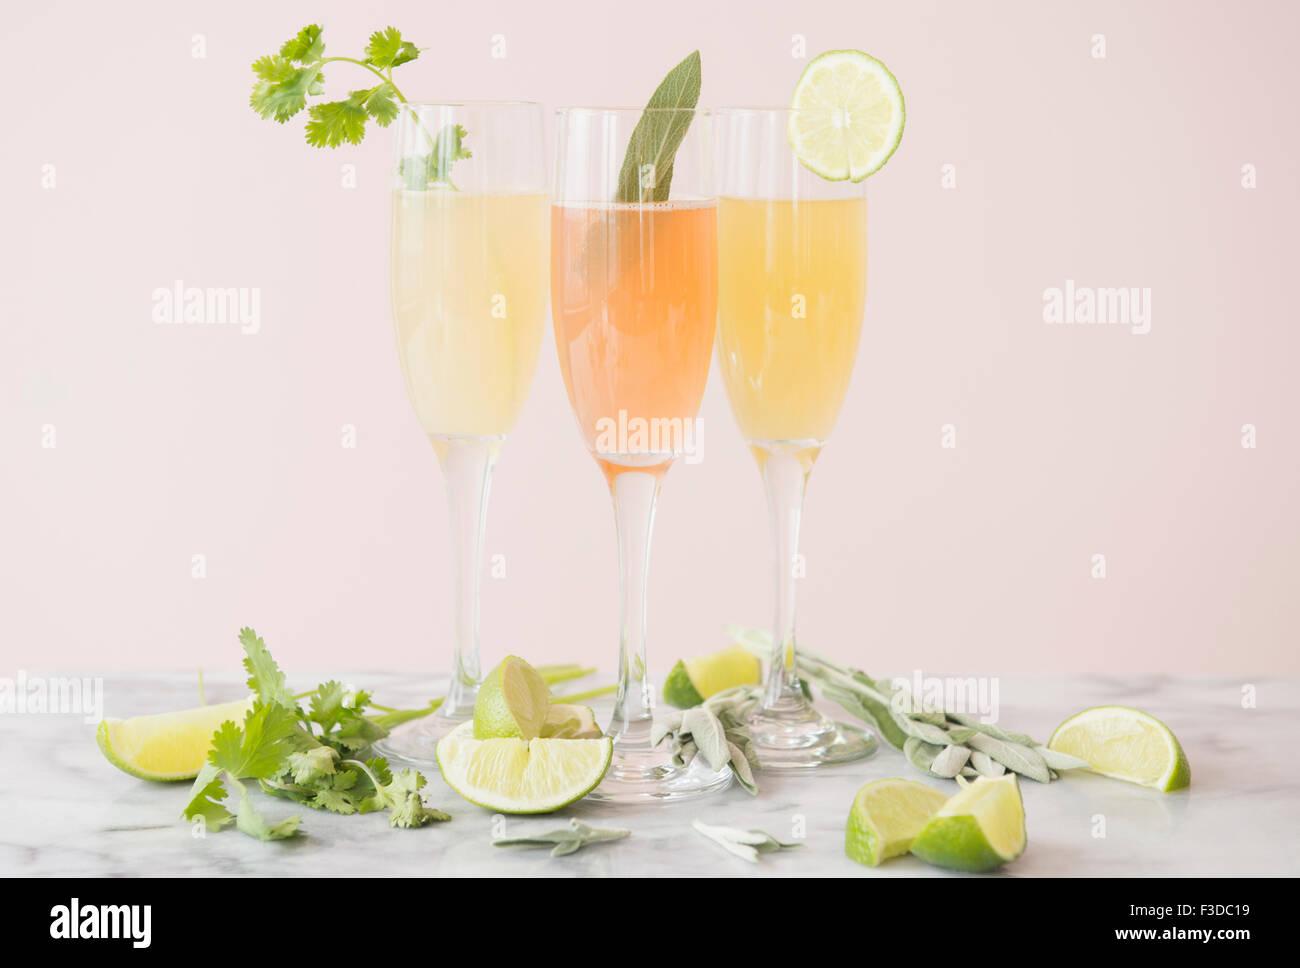 Foto de estudio de refrescantes cócteles Imagen De Stock